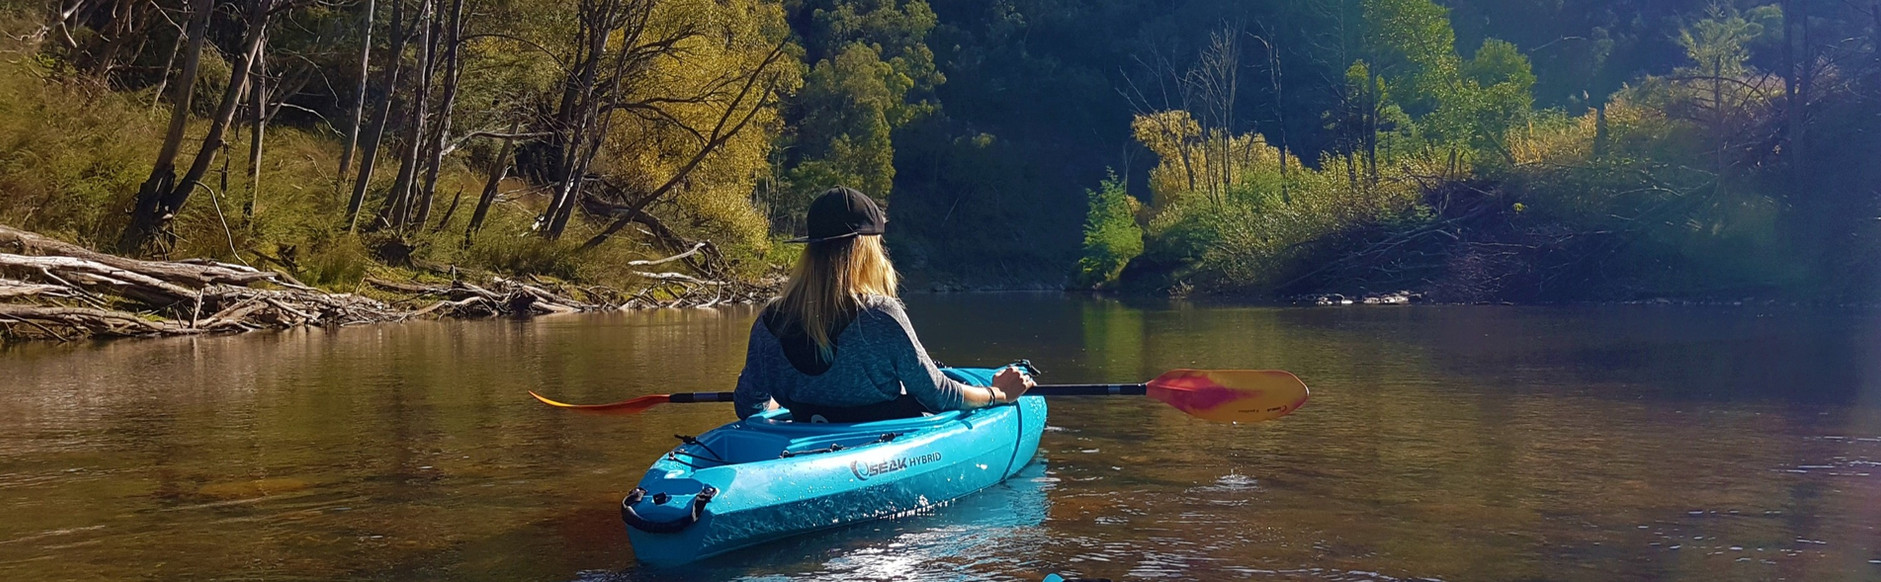 Kayak rental on the Jamieson and Golbourn River